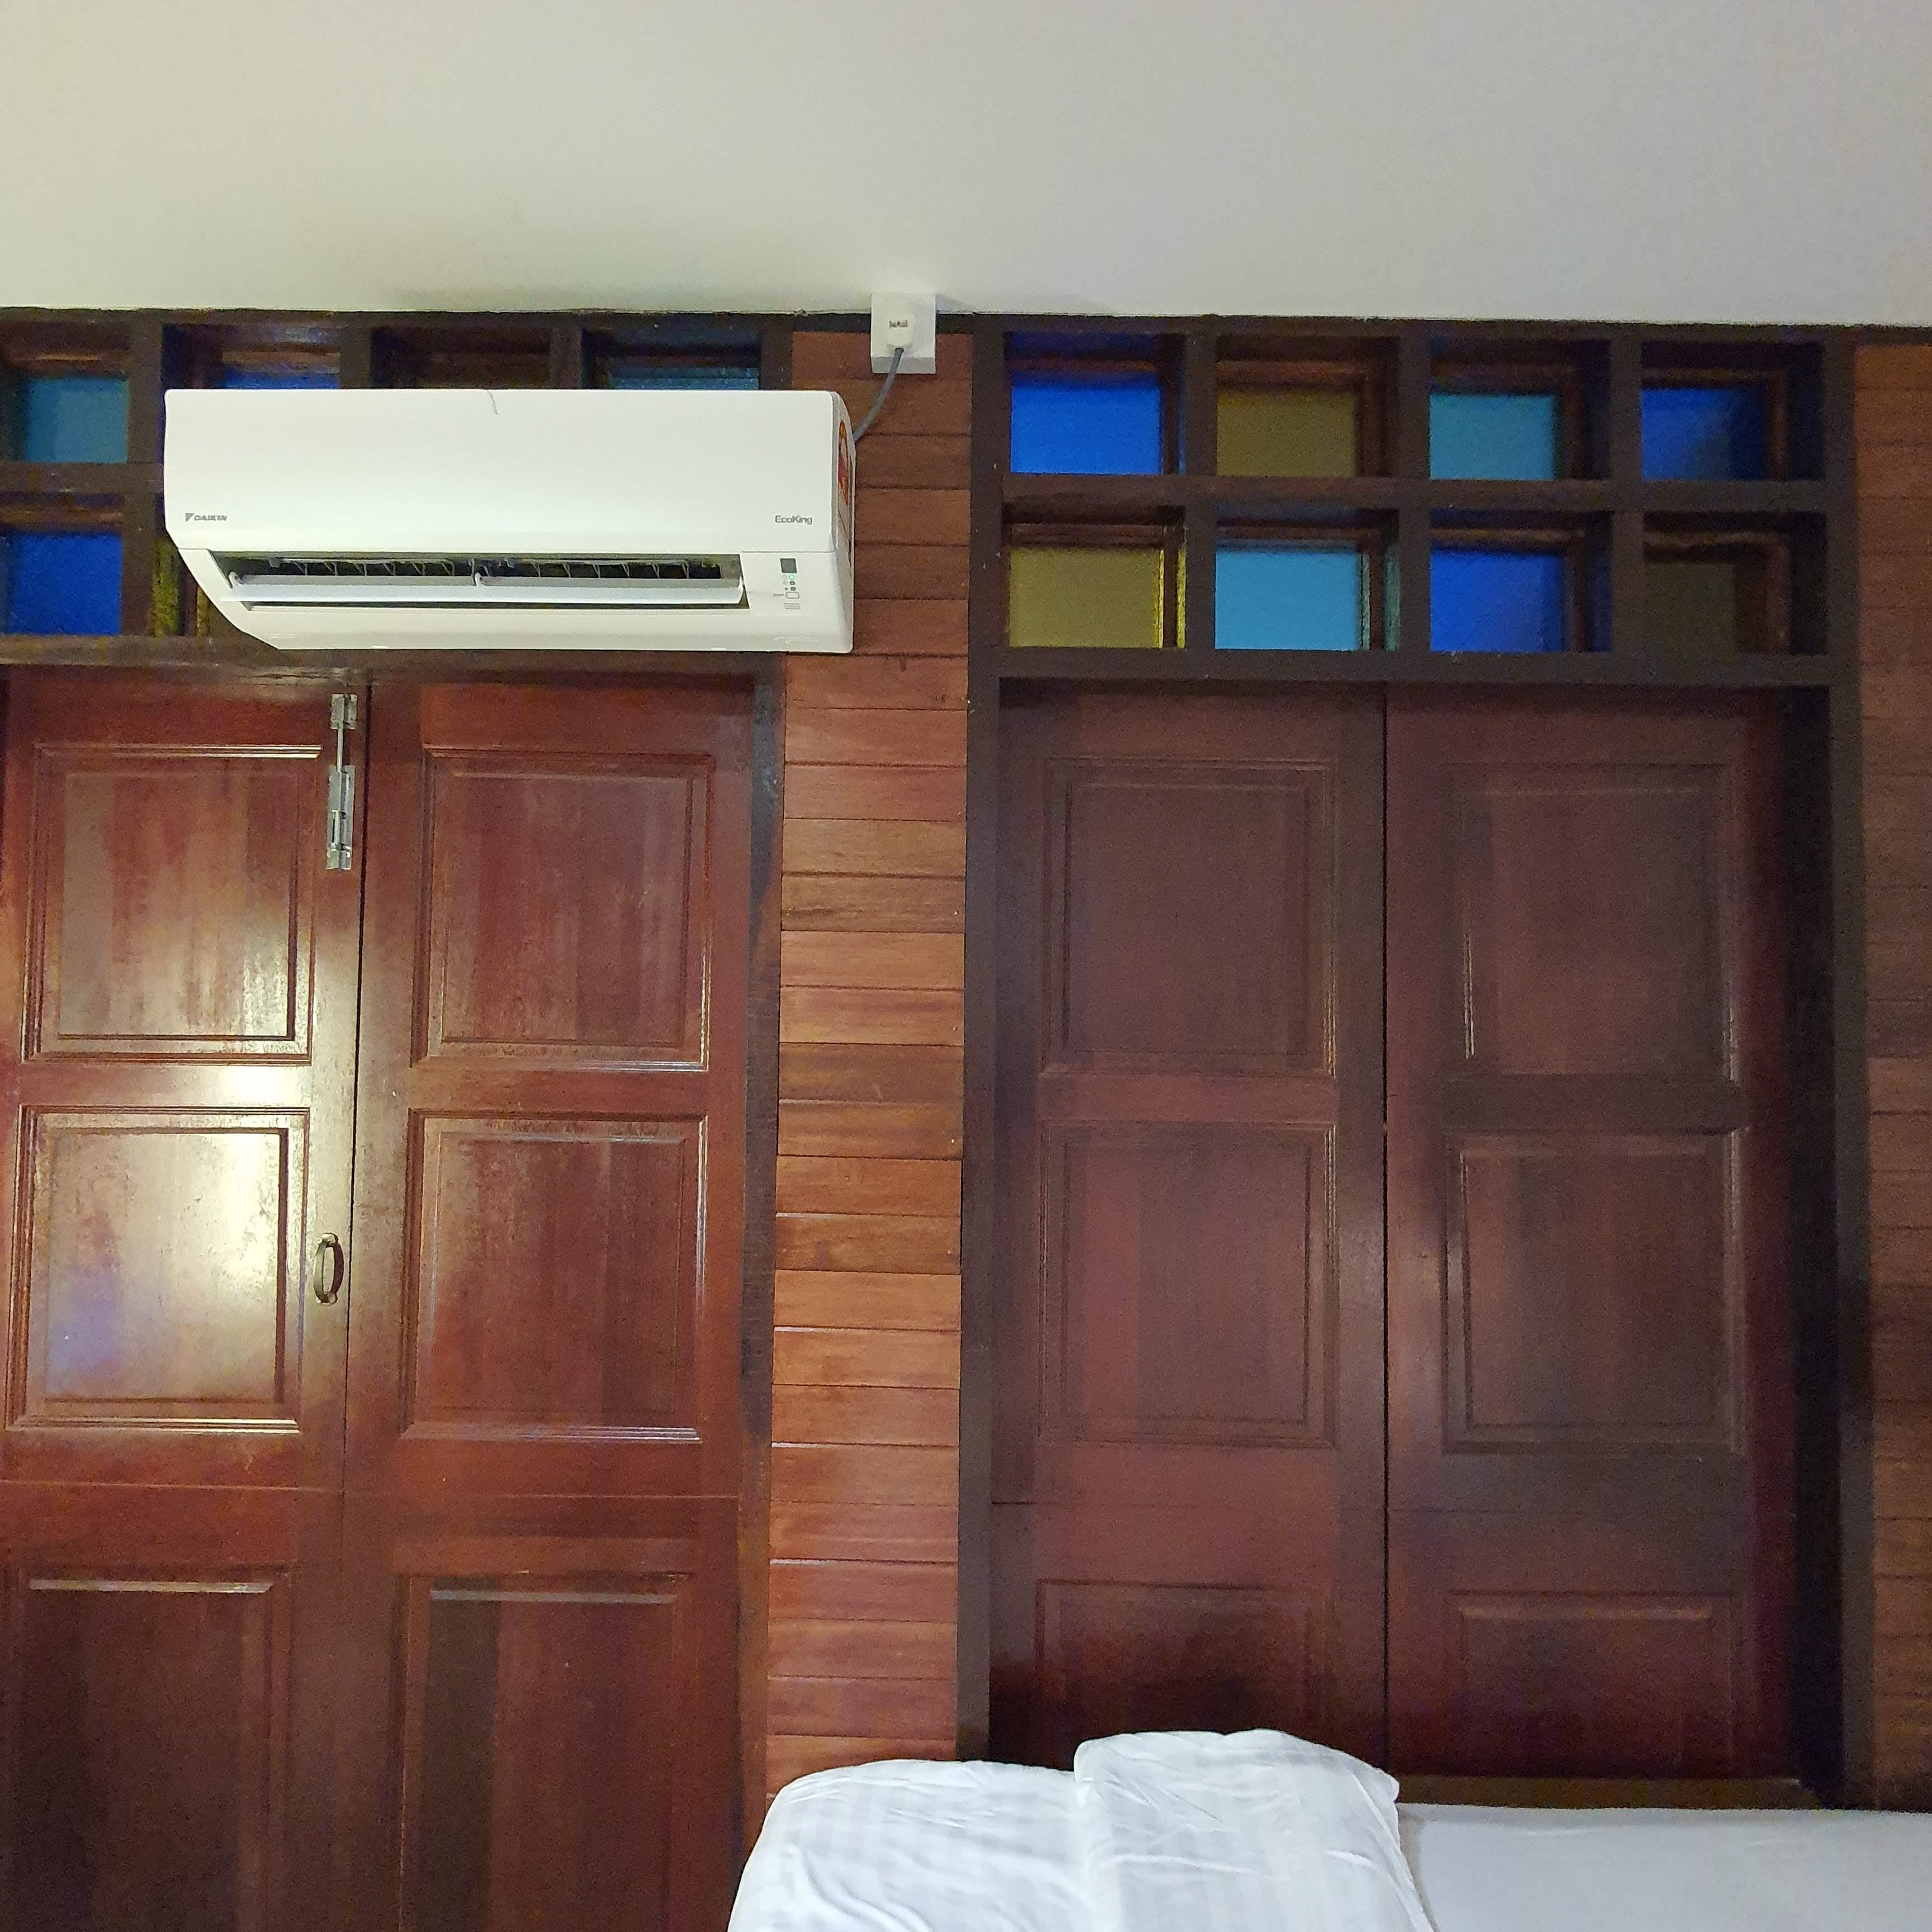 Little Kampung Studio, Teluk Intan